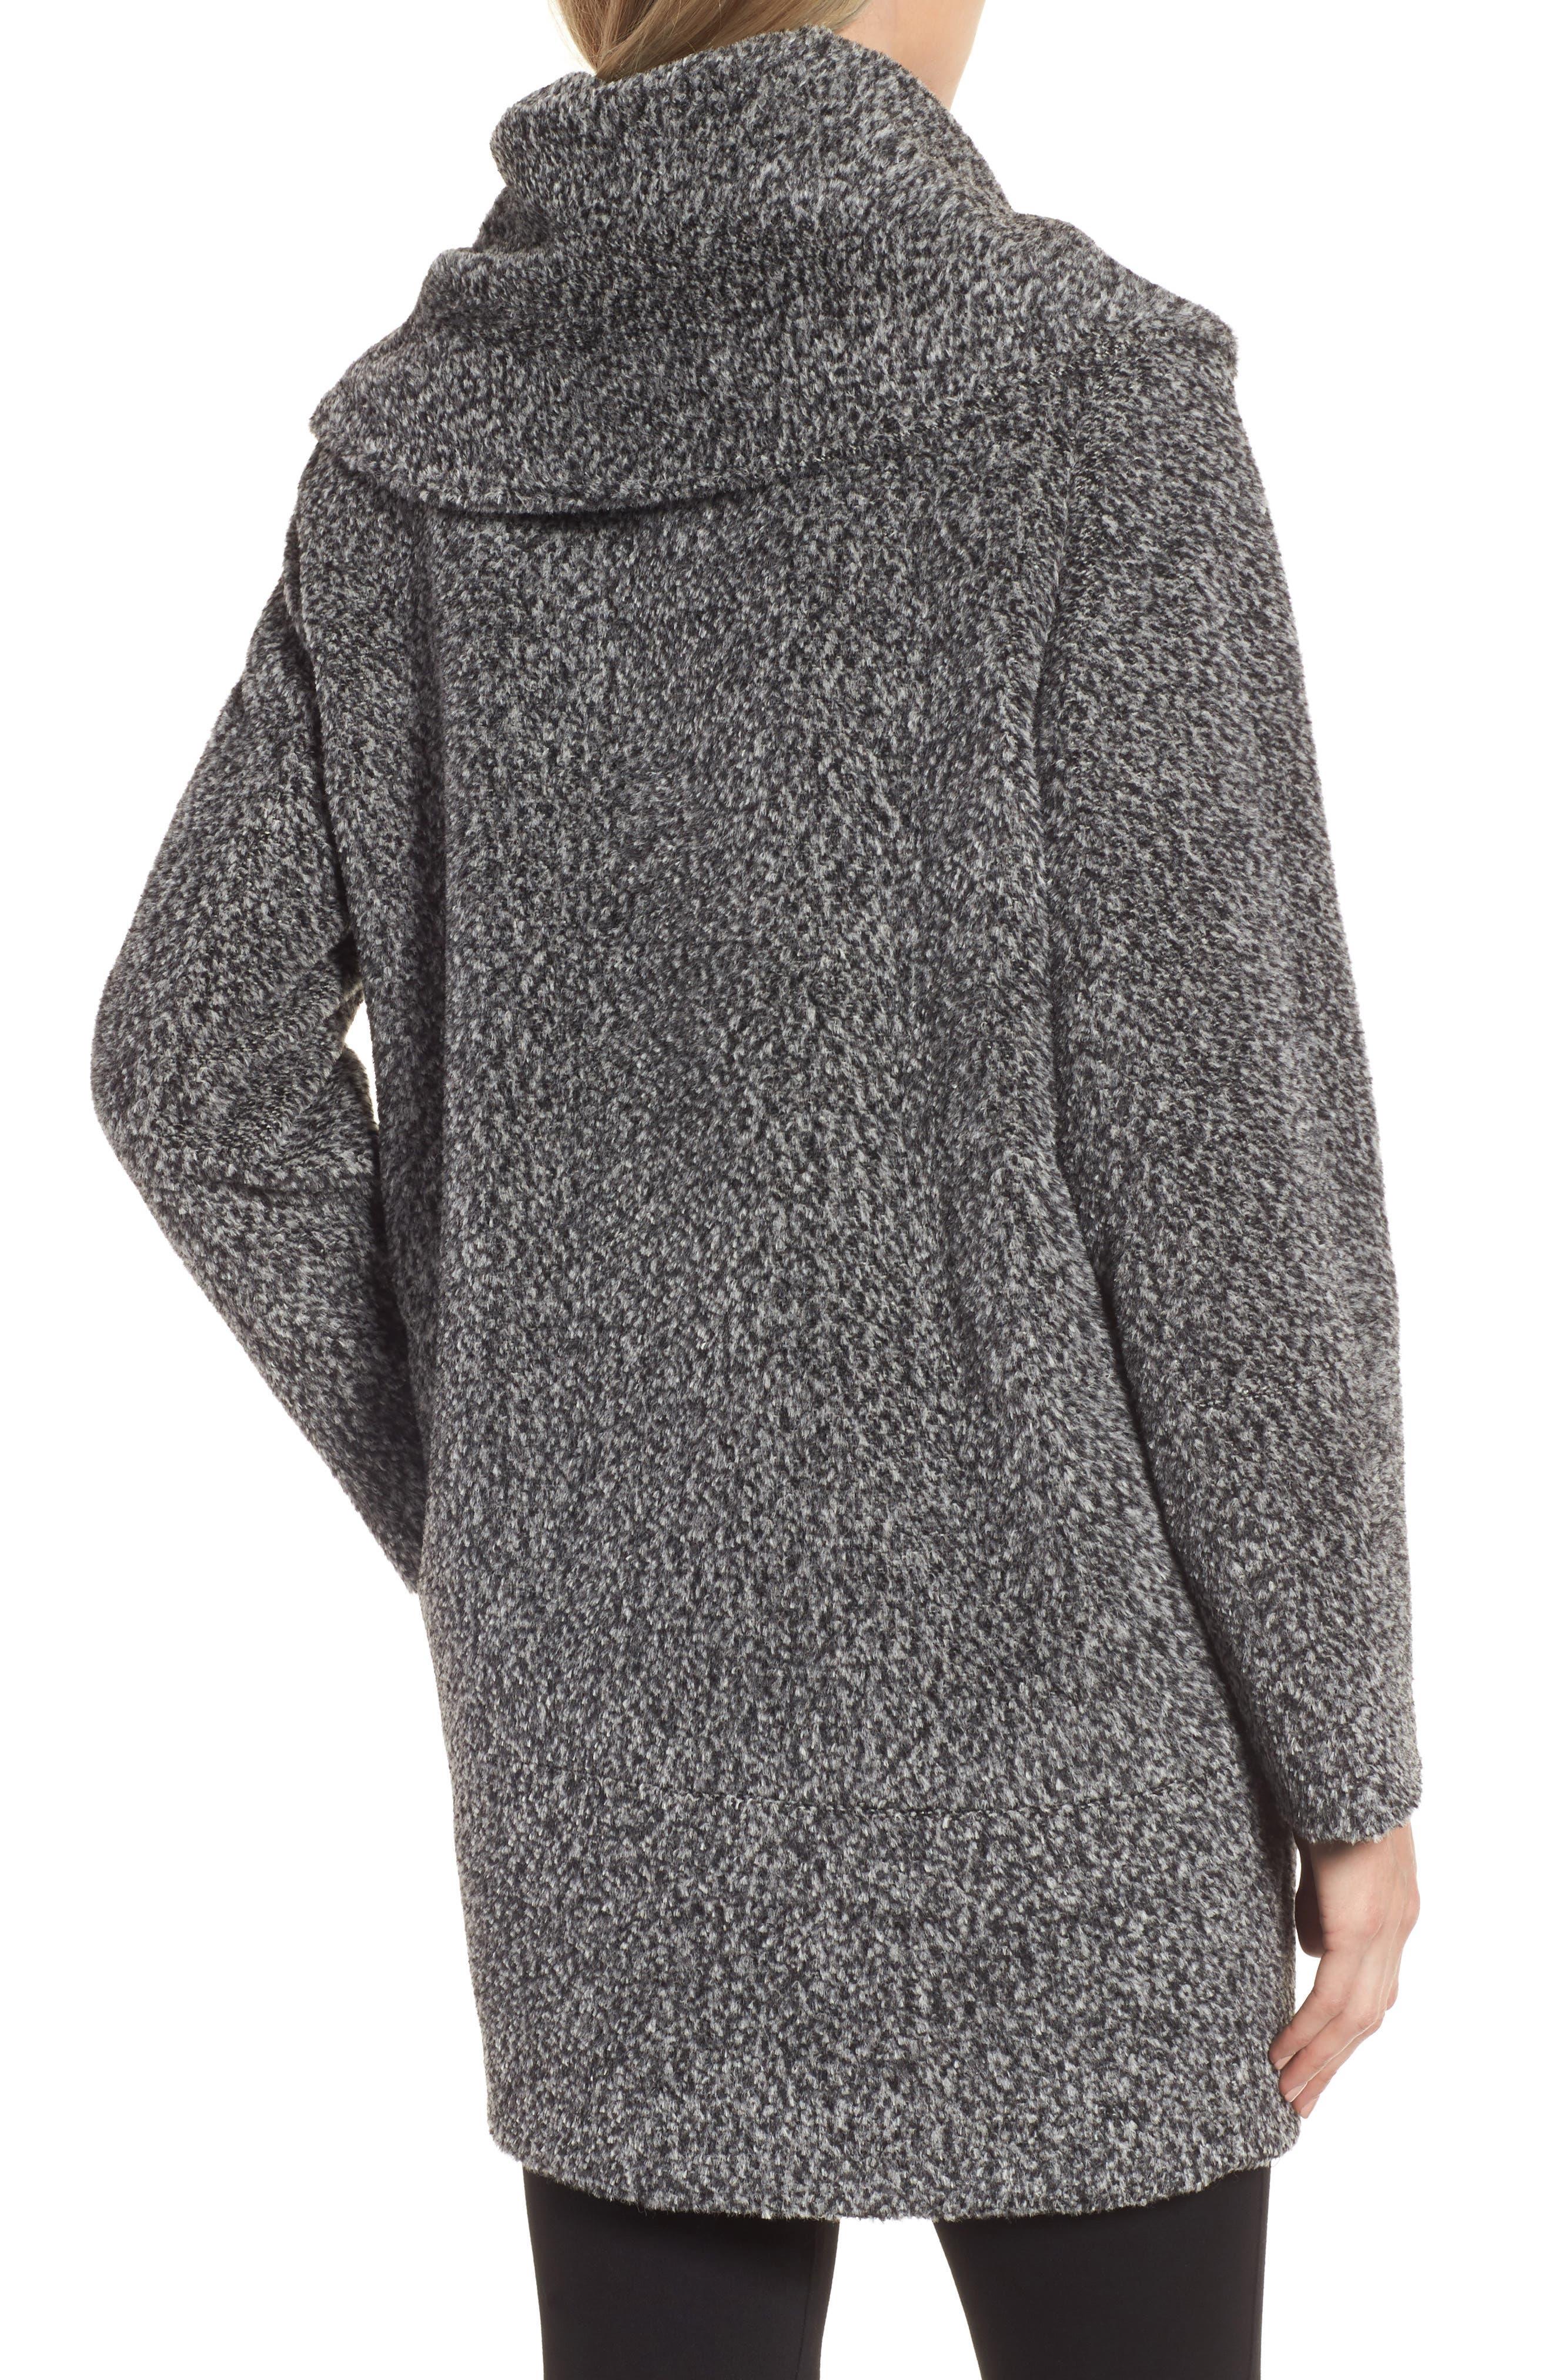 Wool Blend Coat,                             Alternate thumbnail 2, color,                             011